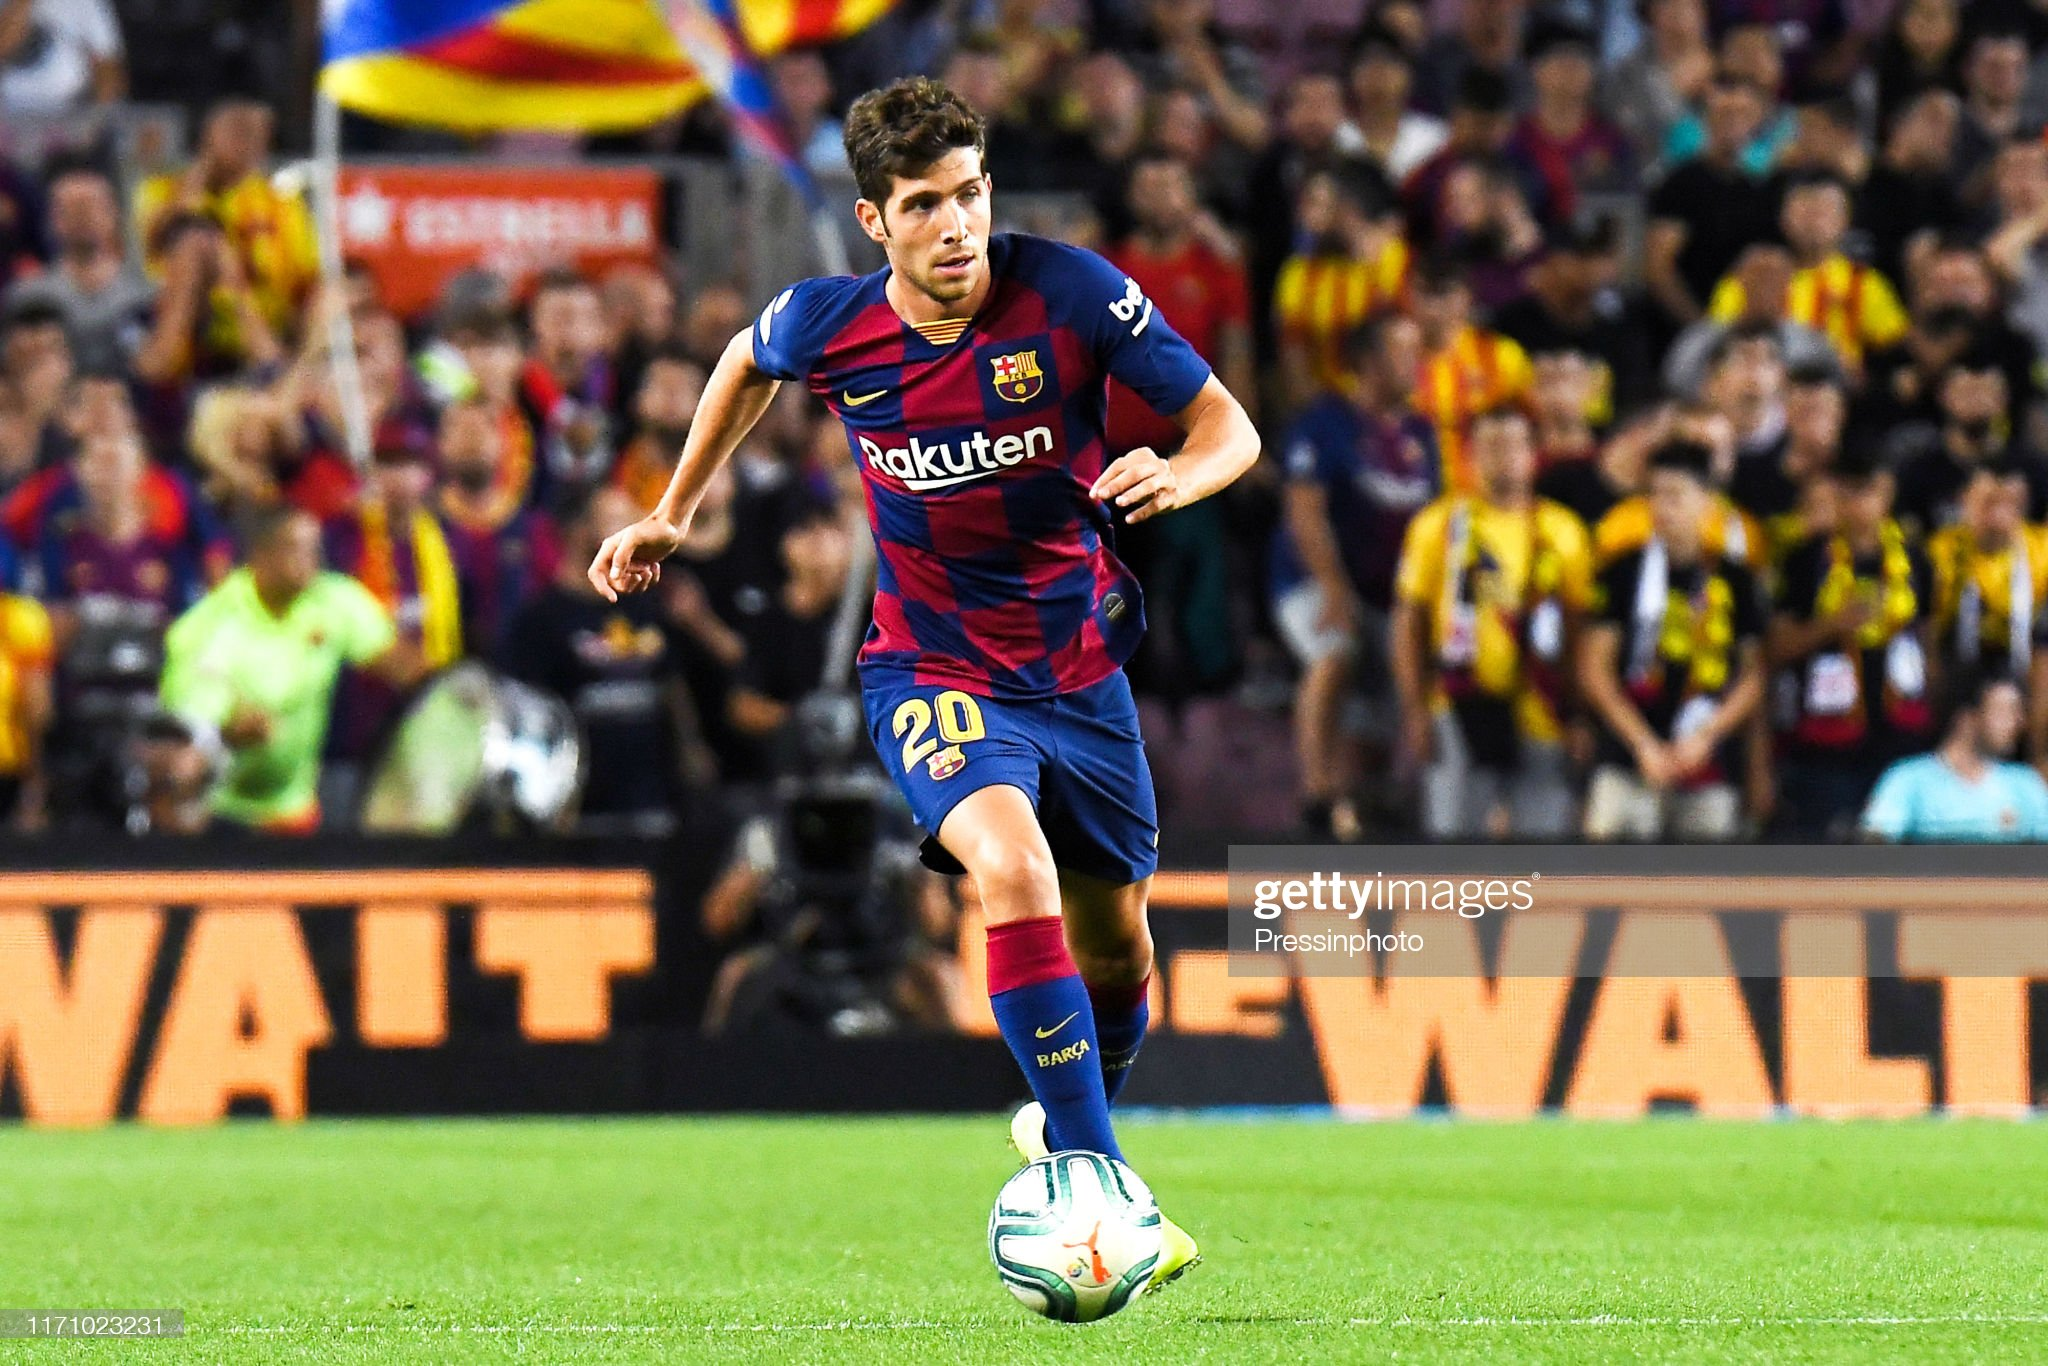 صور مباراة : برشلونة - فياريال 2-1 ( 24-09-2019 )  Sergi-roberto-of-fc-barcelona-during-the-liga-match-between-barcelona-picture-id1171023231?s=2048x2048